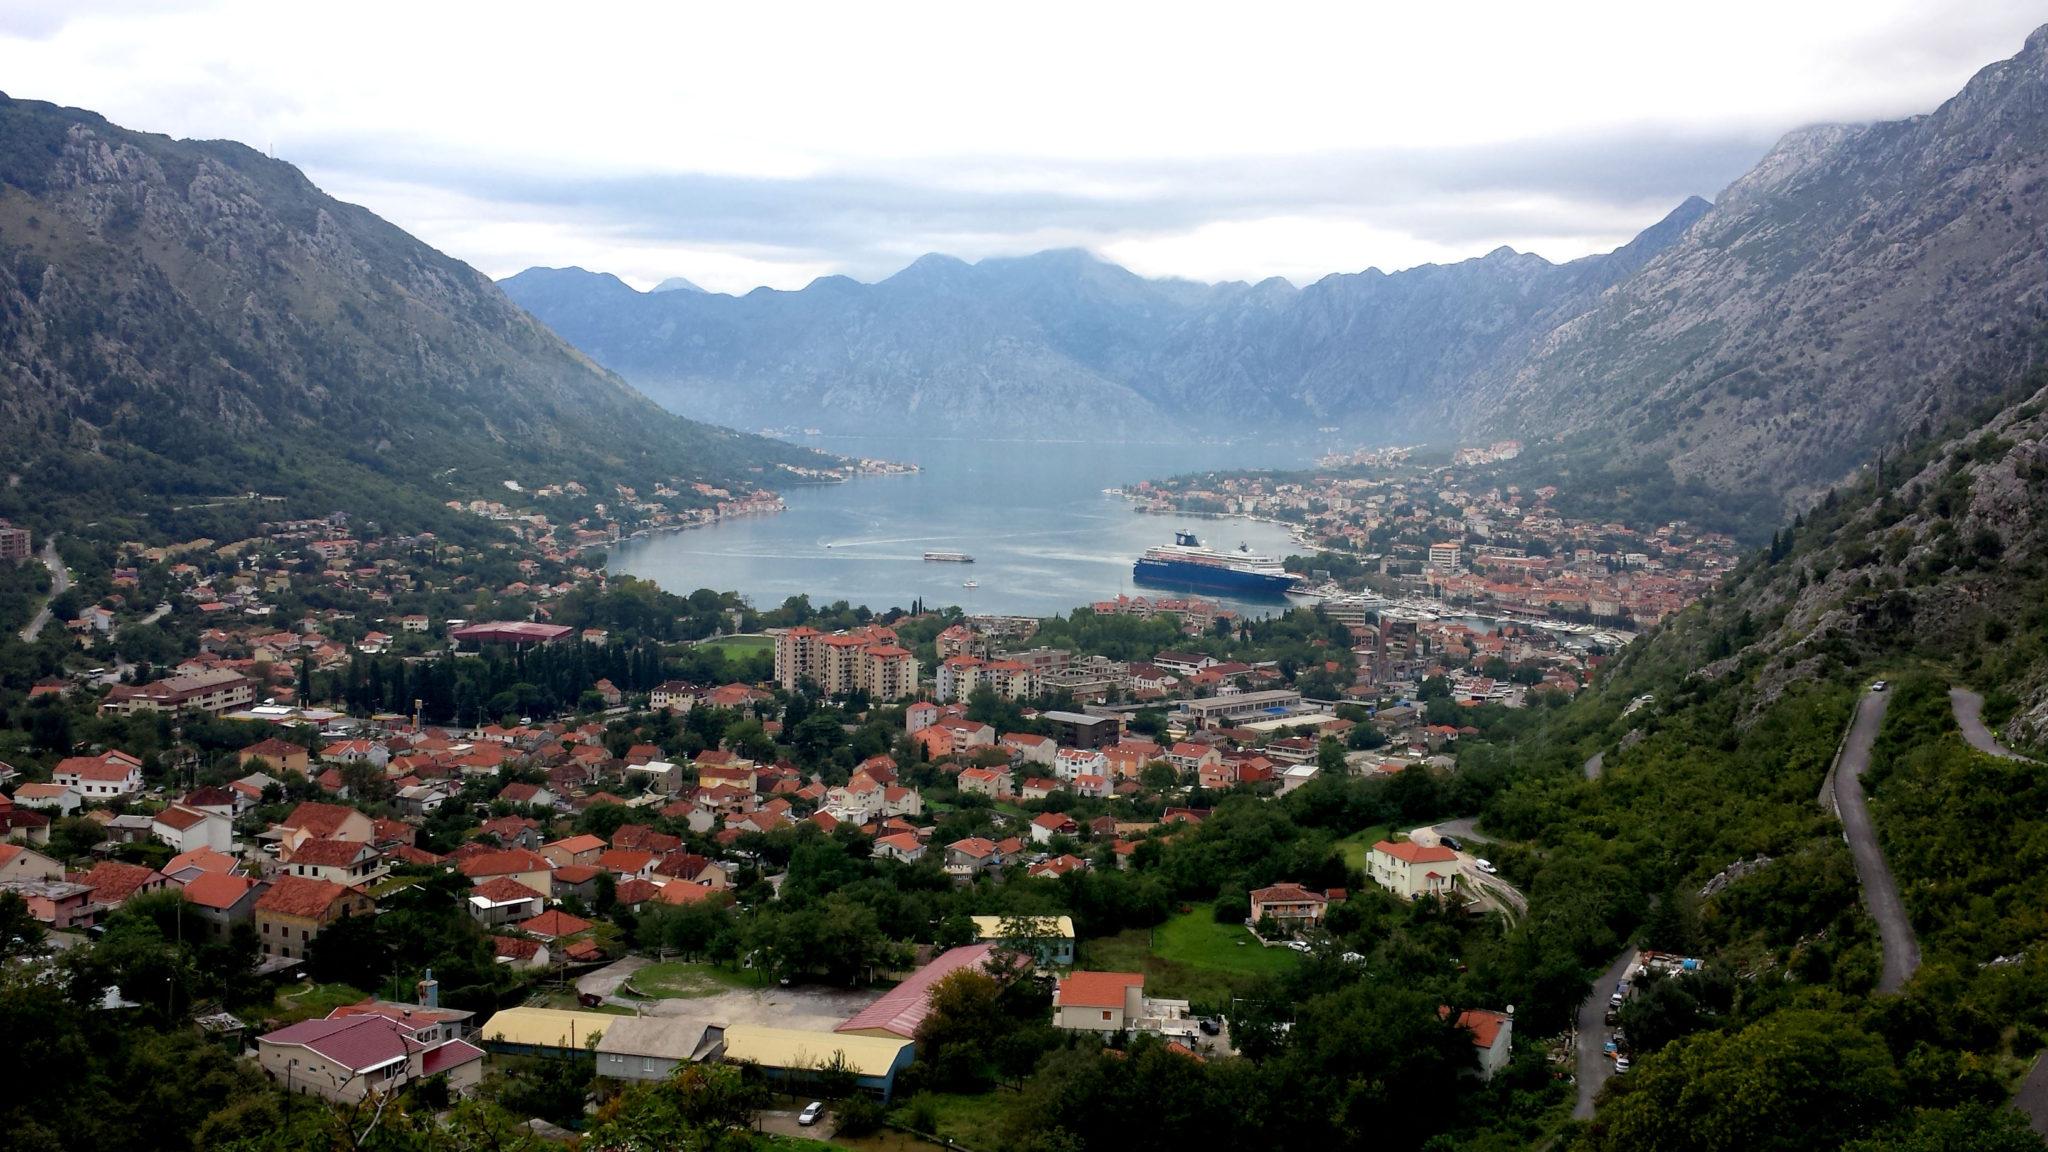 Hema_Le_parc_Lovcen_blog_voyage_travel_kotor_serpentine2